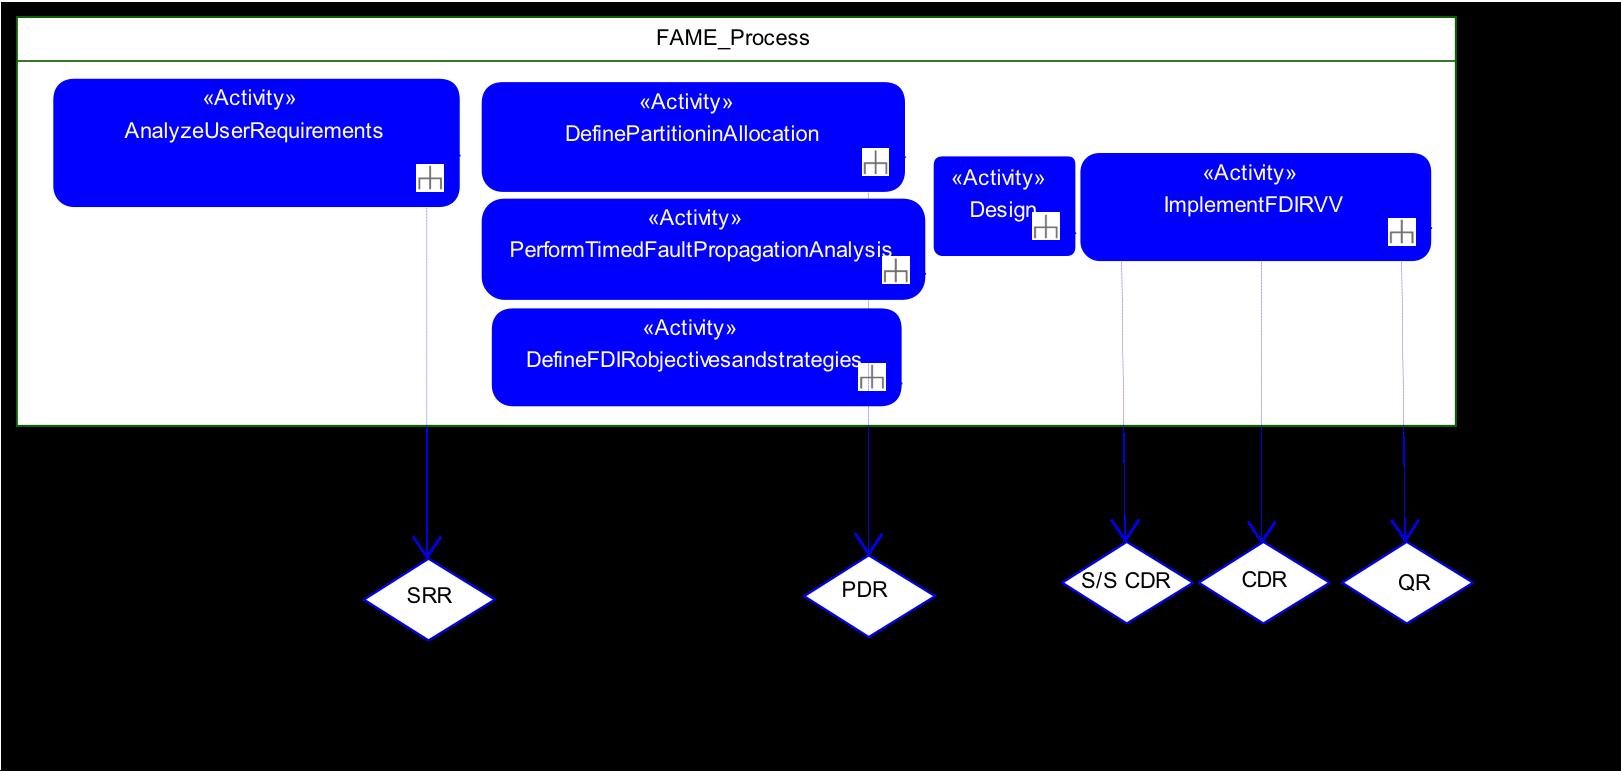 FAME Process